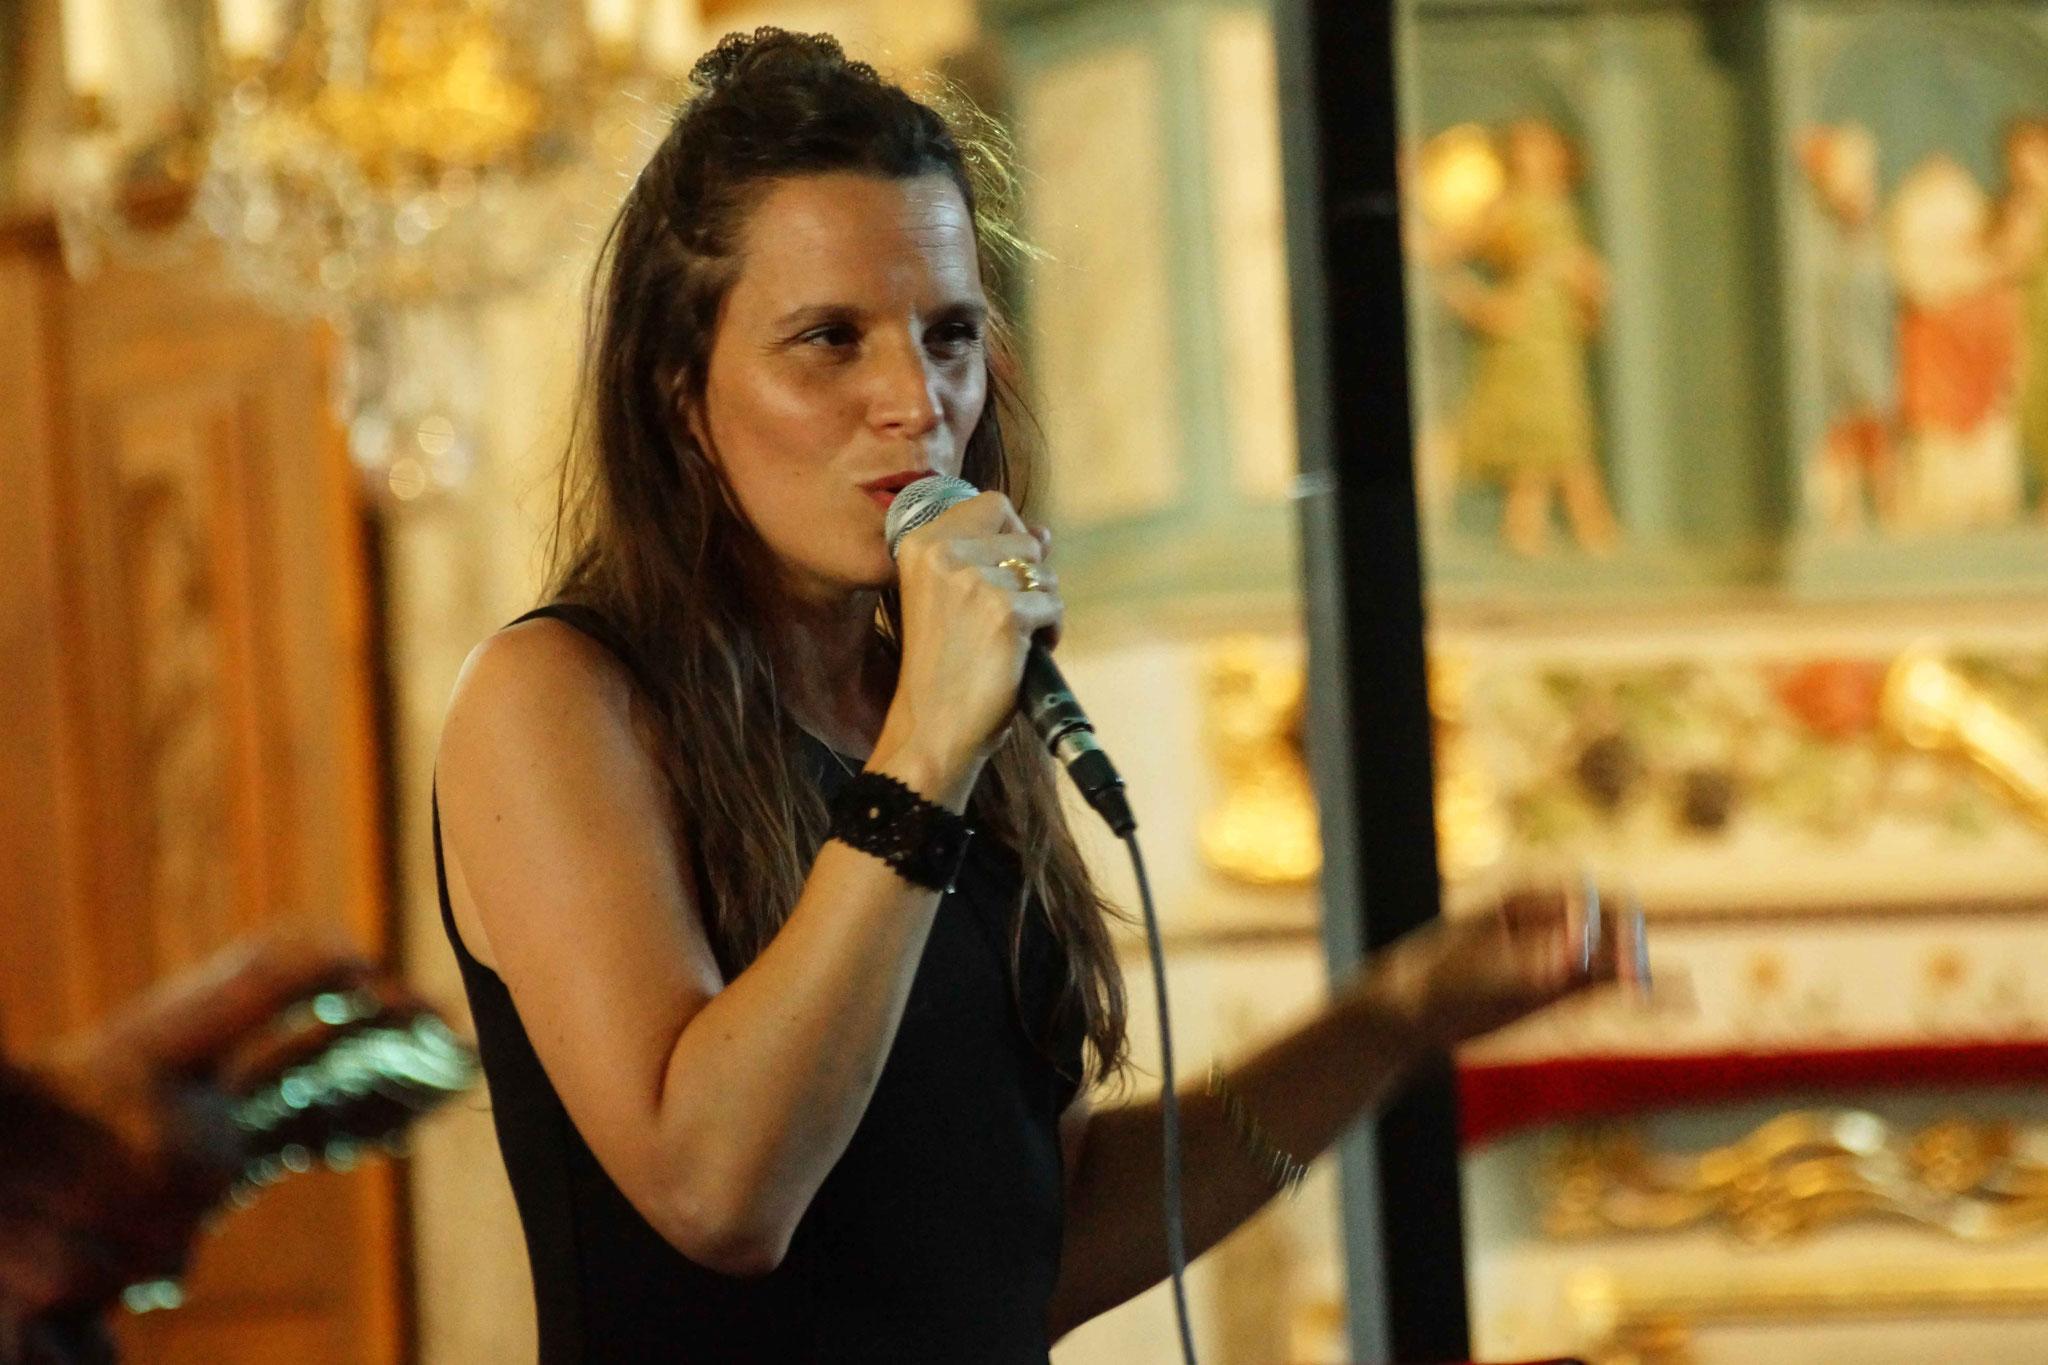 Concert de Guimilliau avec Jean-Marc Amis, Vendredi 5 août 2016